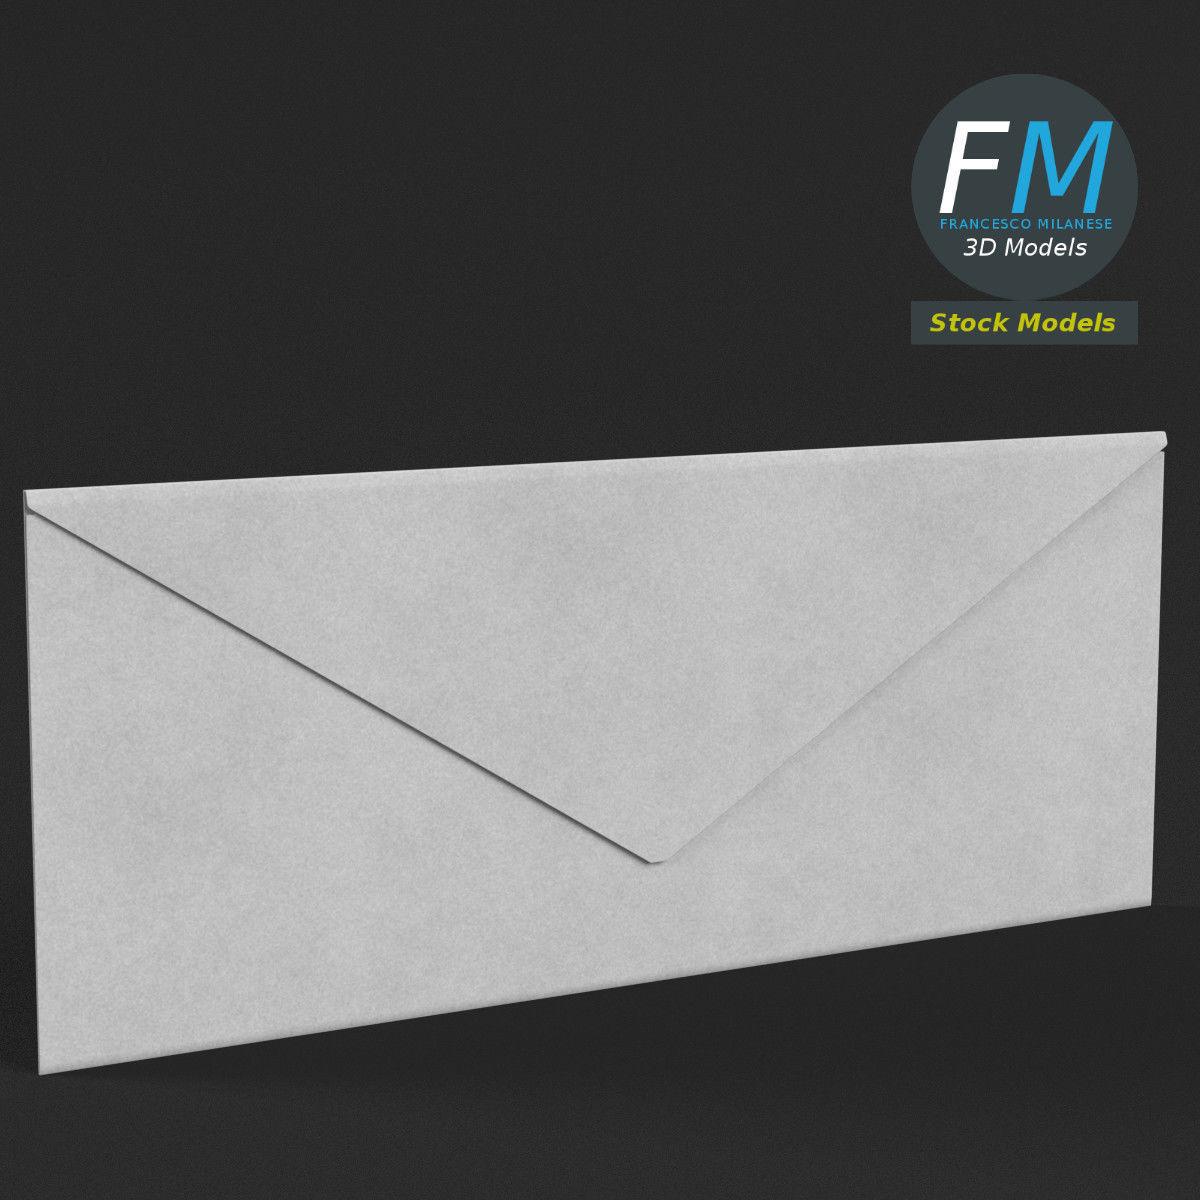 Rectangular envelope closed